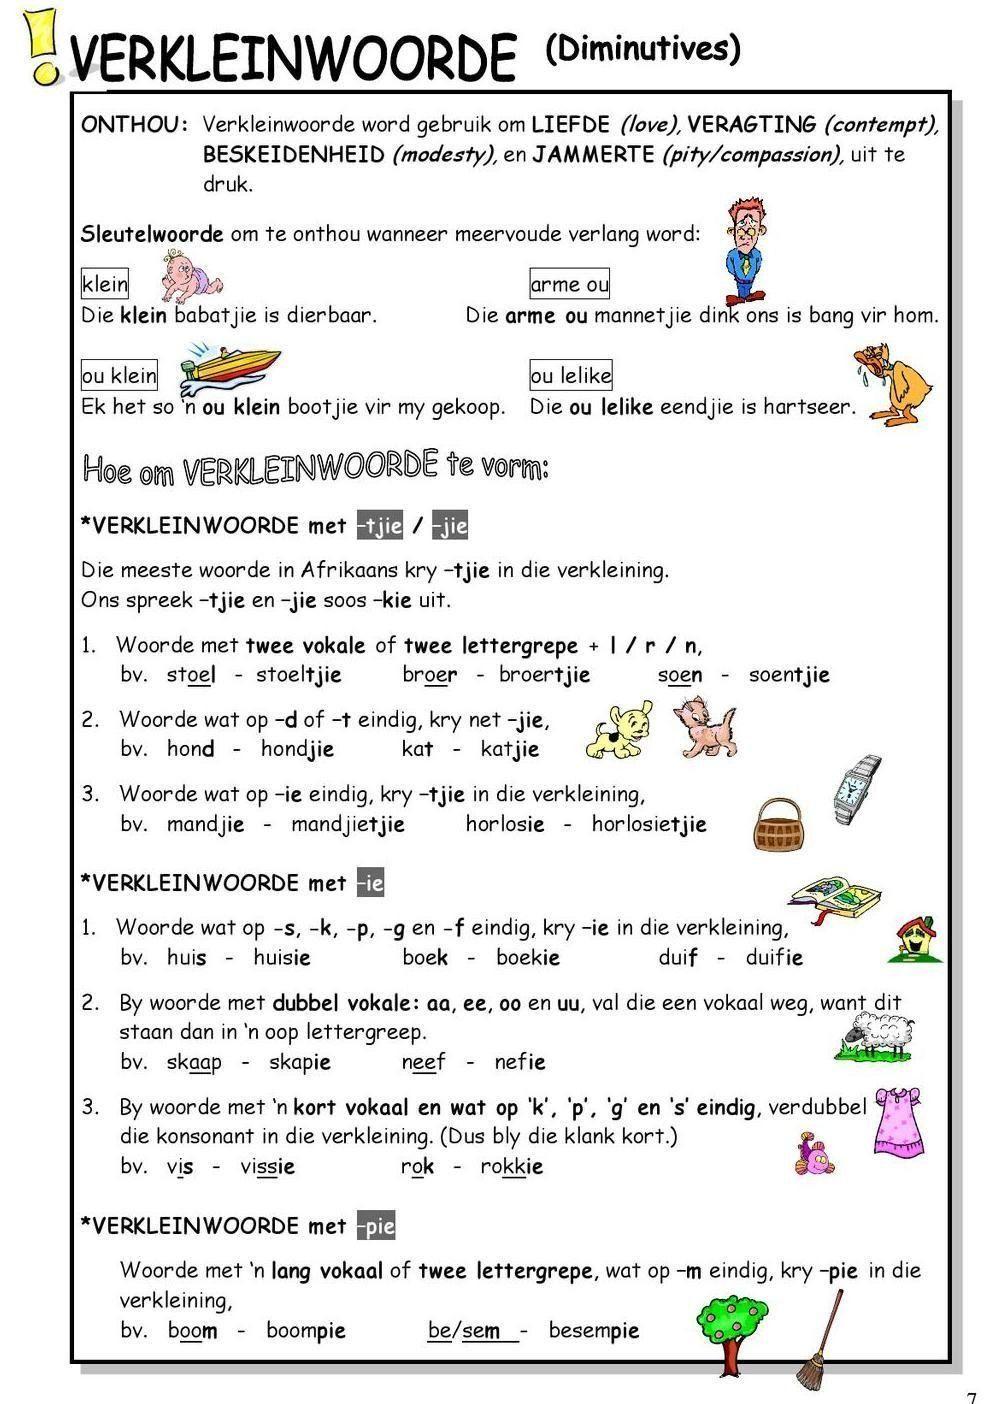 Phonics Worksheets 3rd Grade Worksheets 3rd Learning Grade Afrikaans In 2020 Afrikaans Language Afrikaans Phonics Worksheets